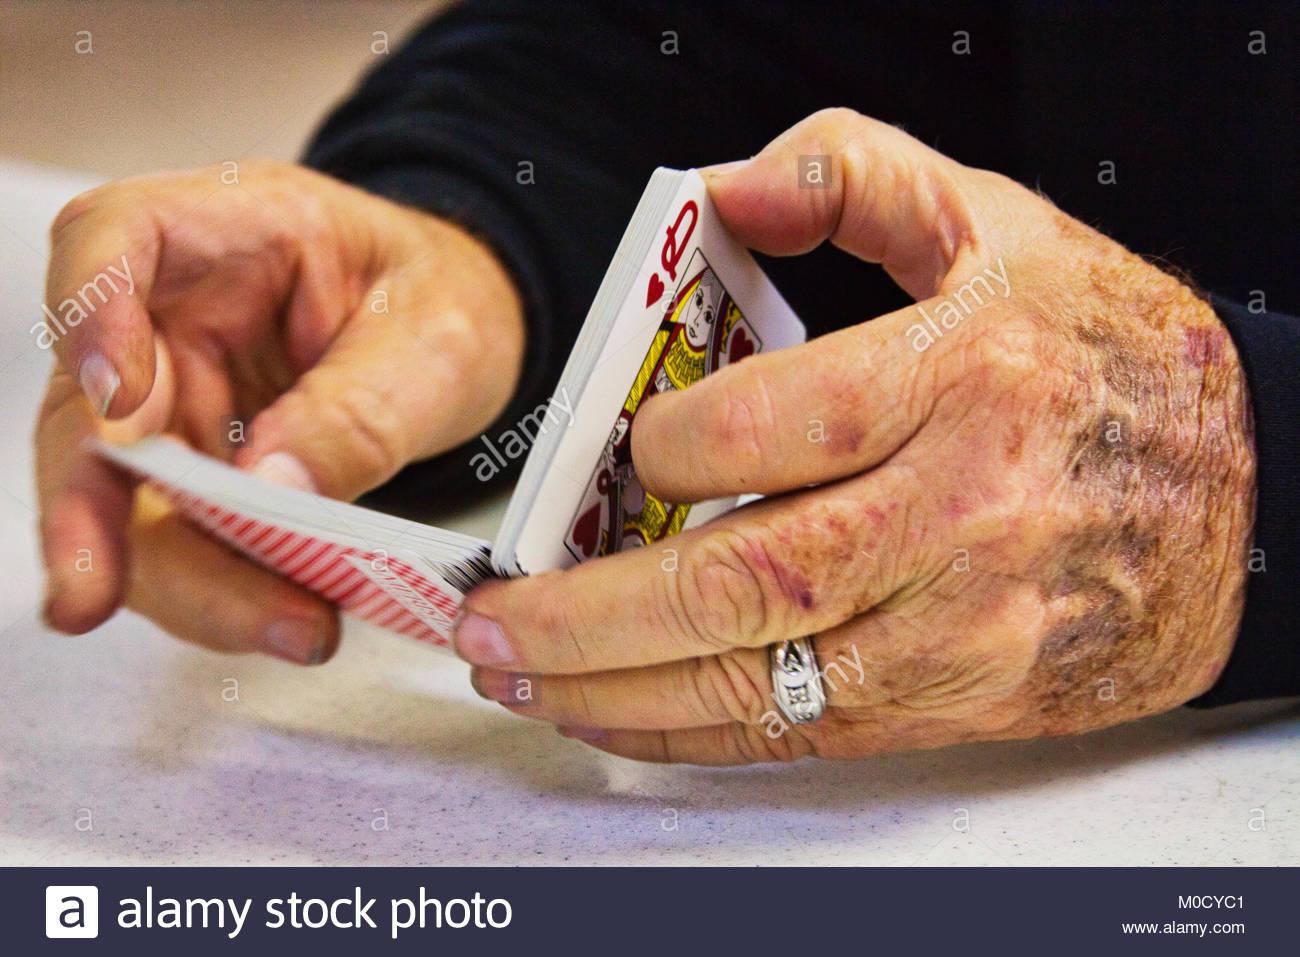 Card shuffling - Stock Image